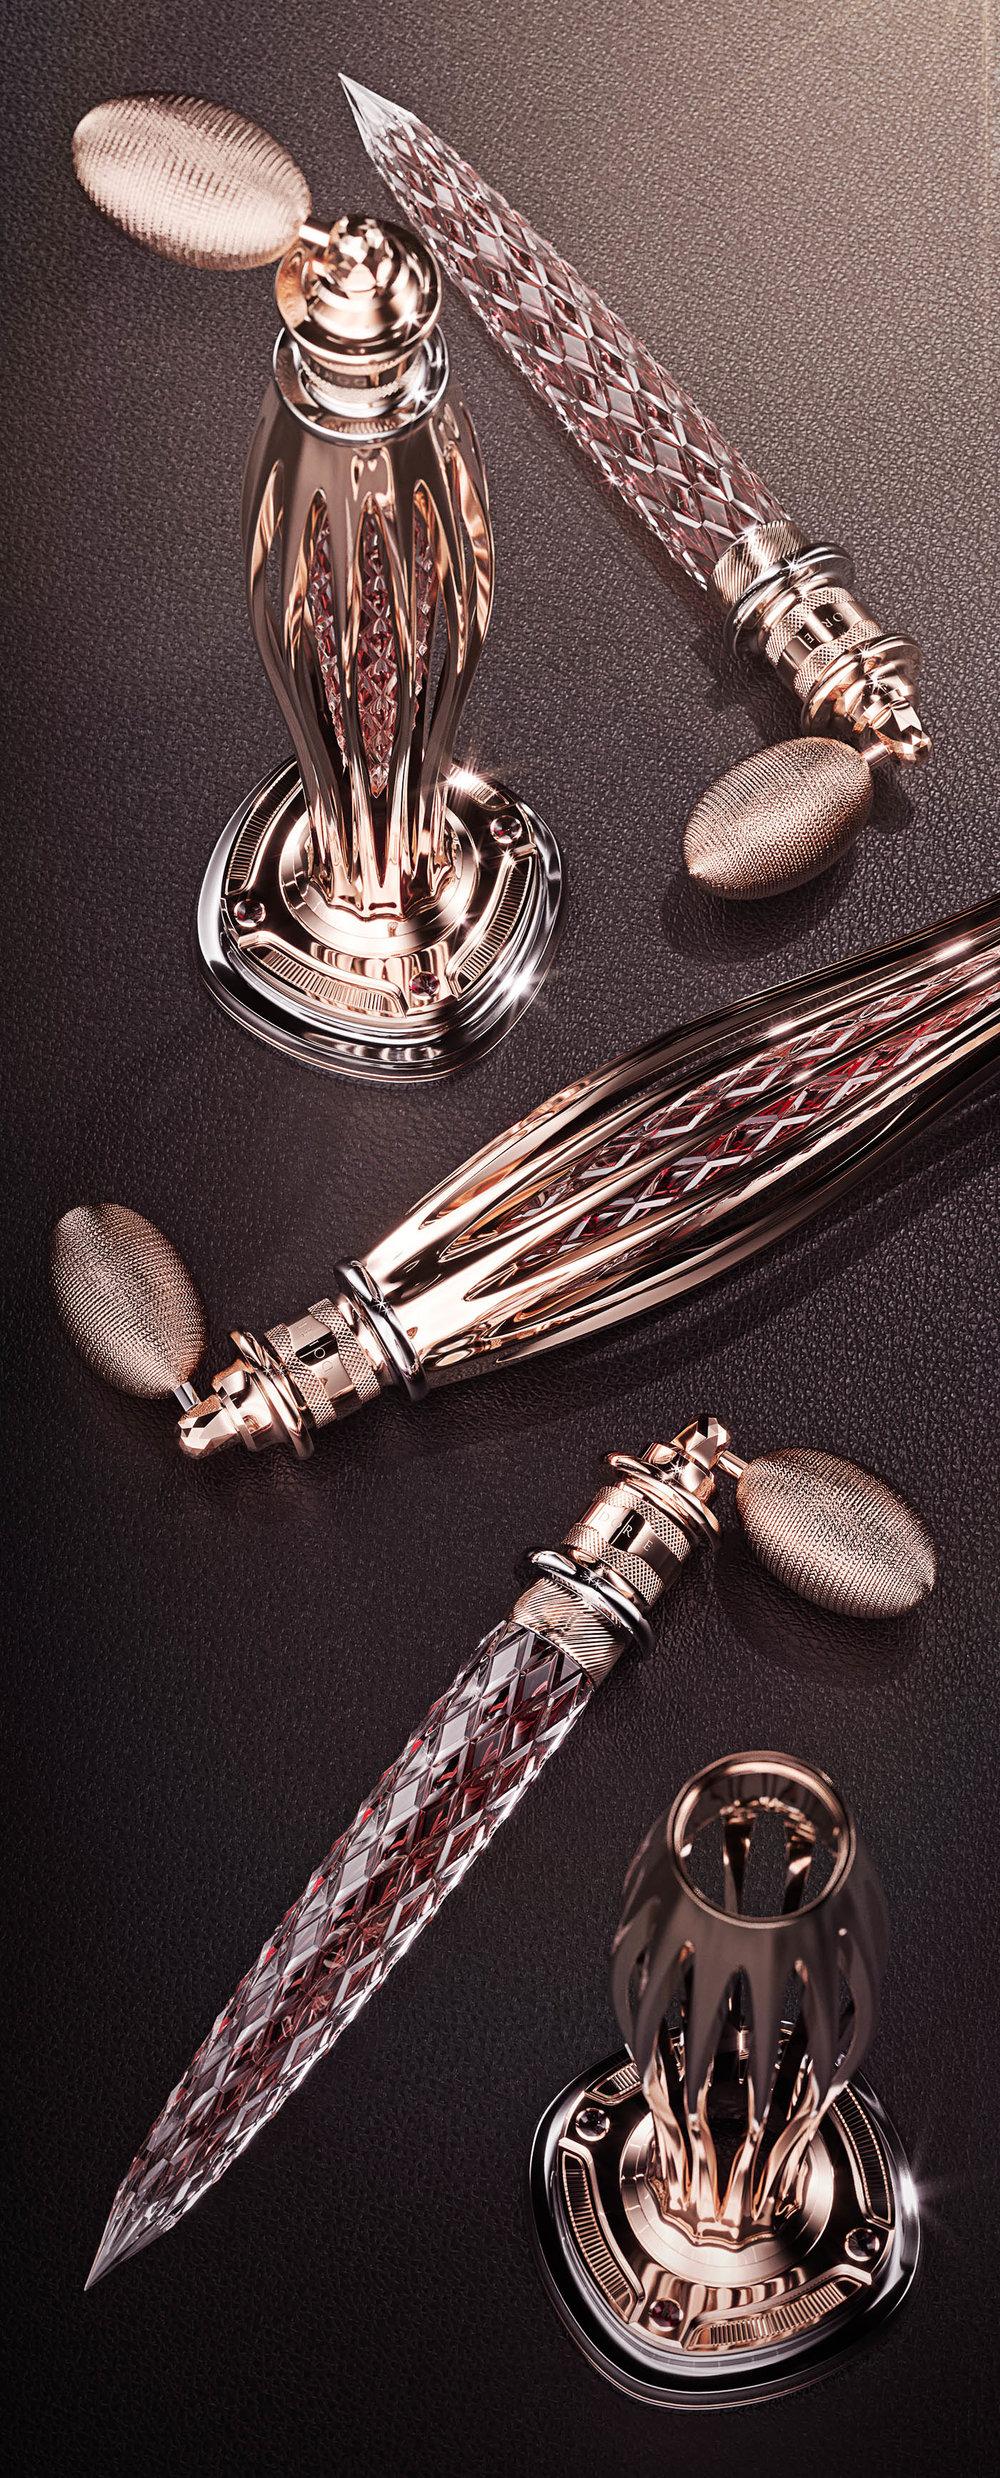 Doree, luxury perfume atomizer 4.jpg